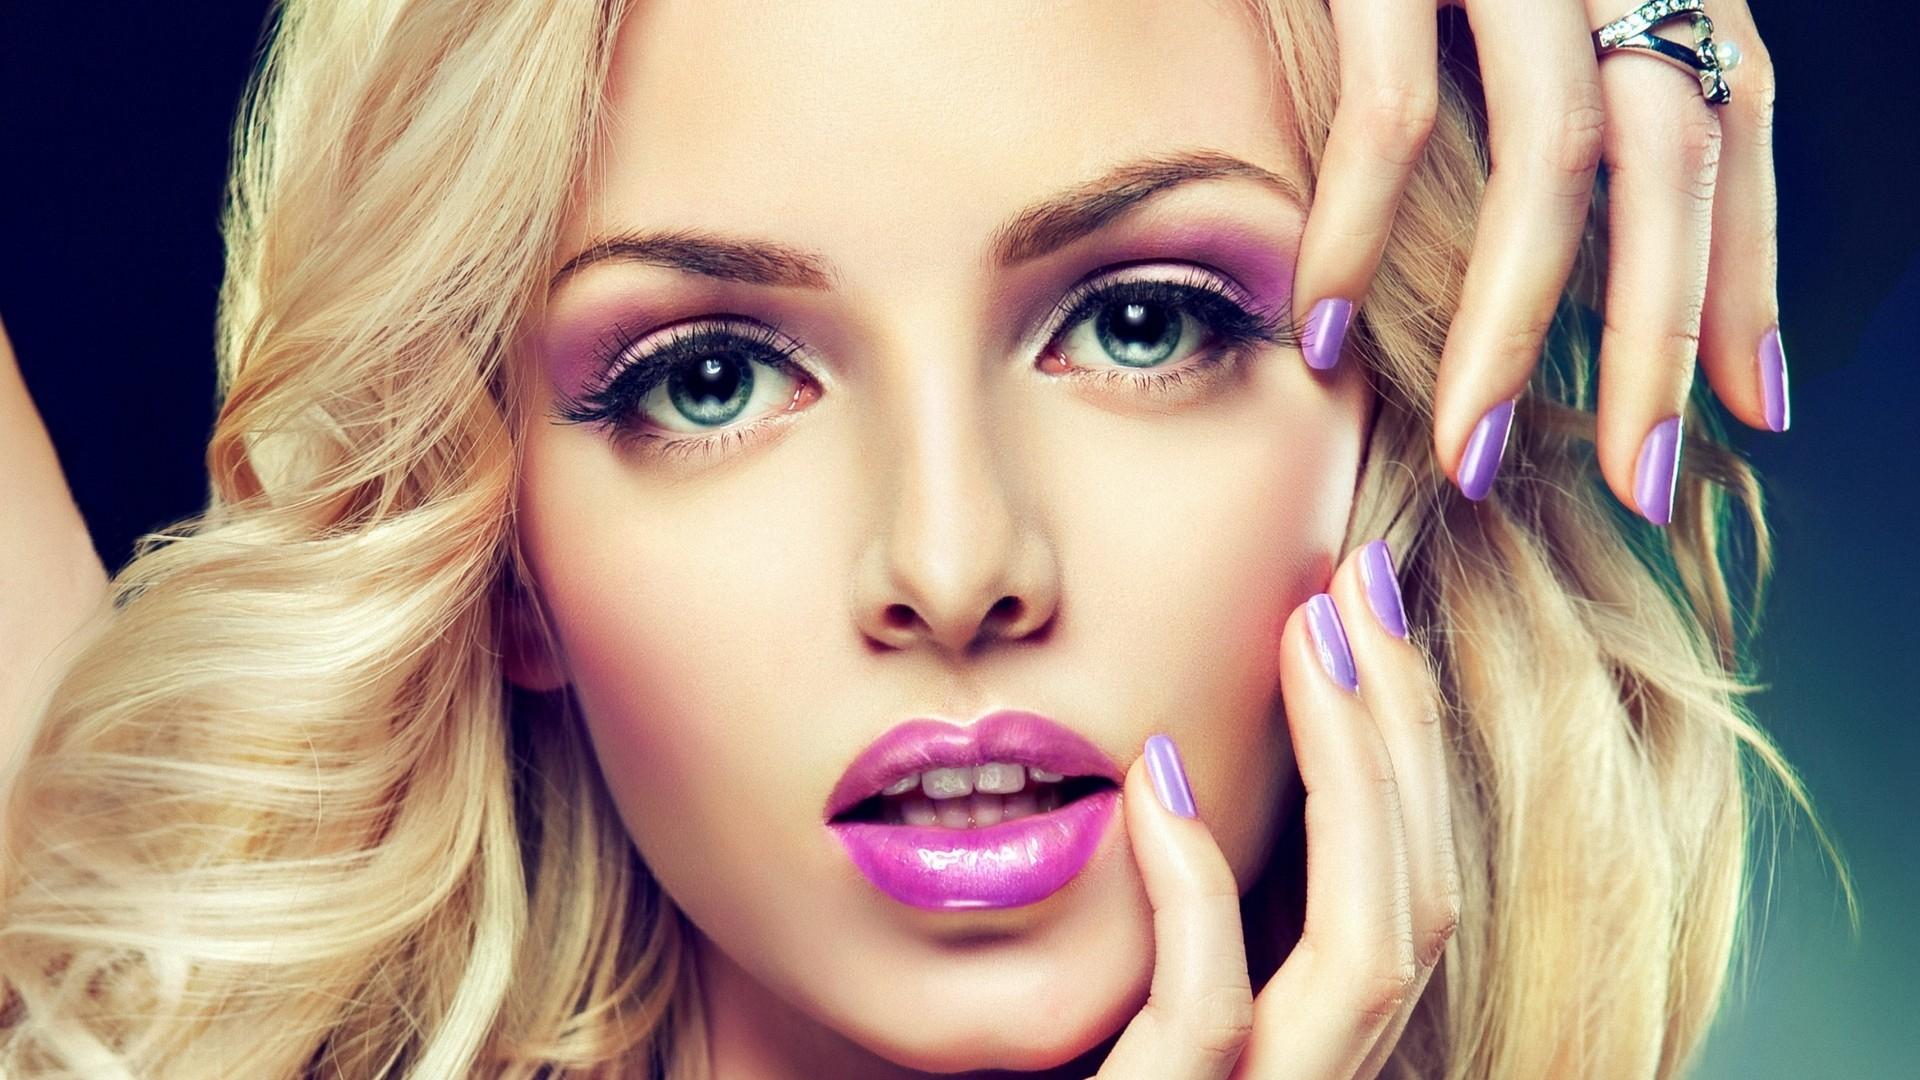 model_face_manicure_make-up_85343_1920x1080